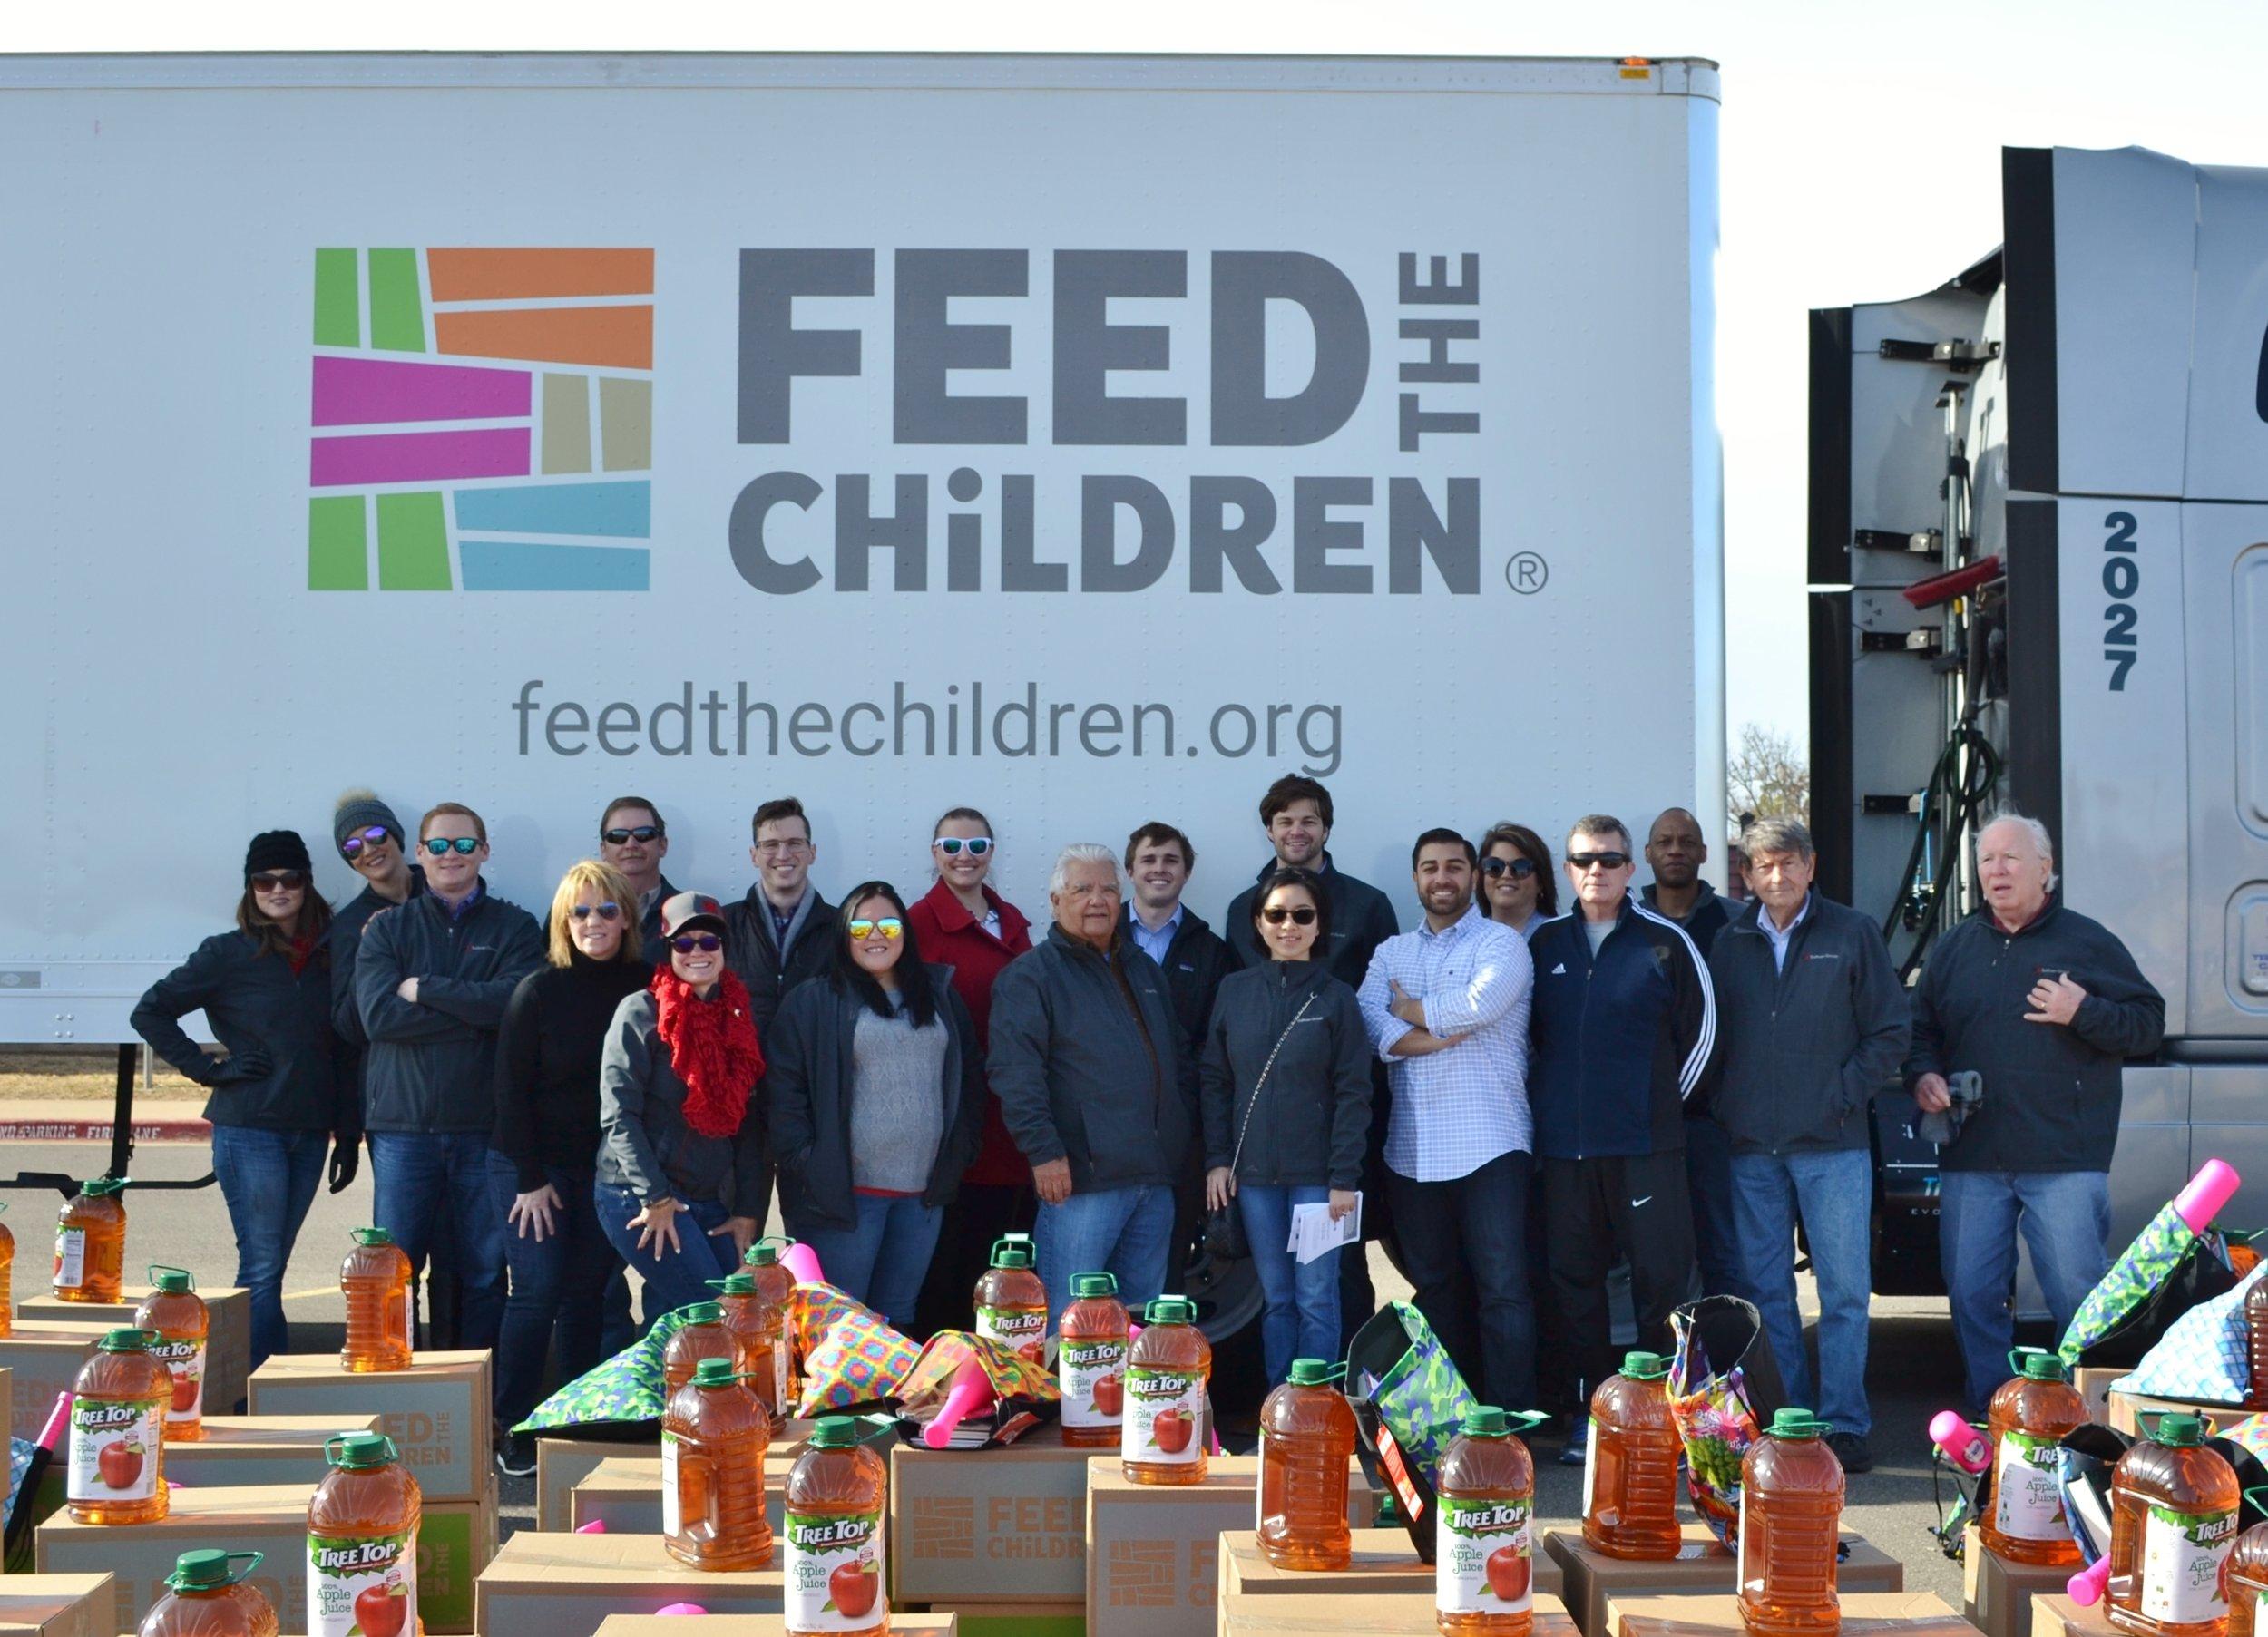 NAI Sullivan professionals at the Feed the Children Event